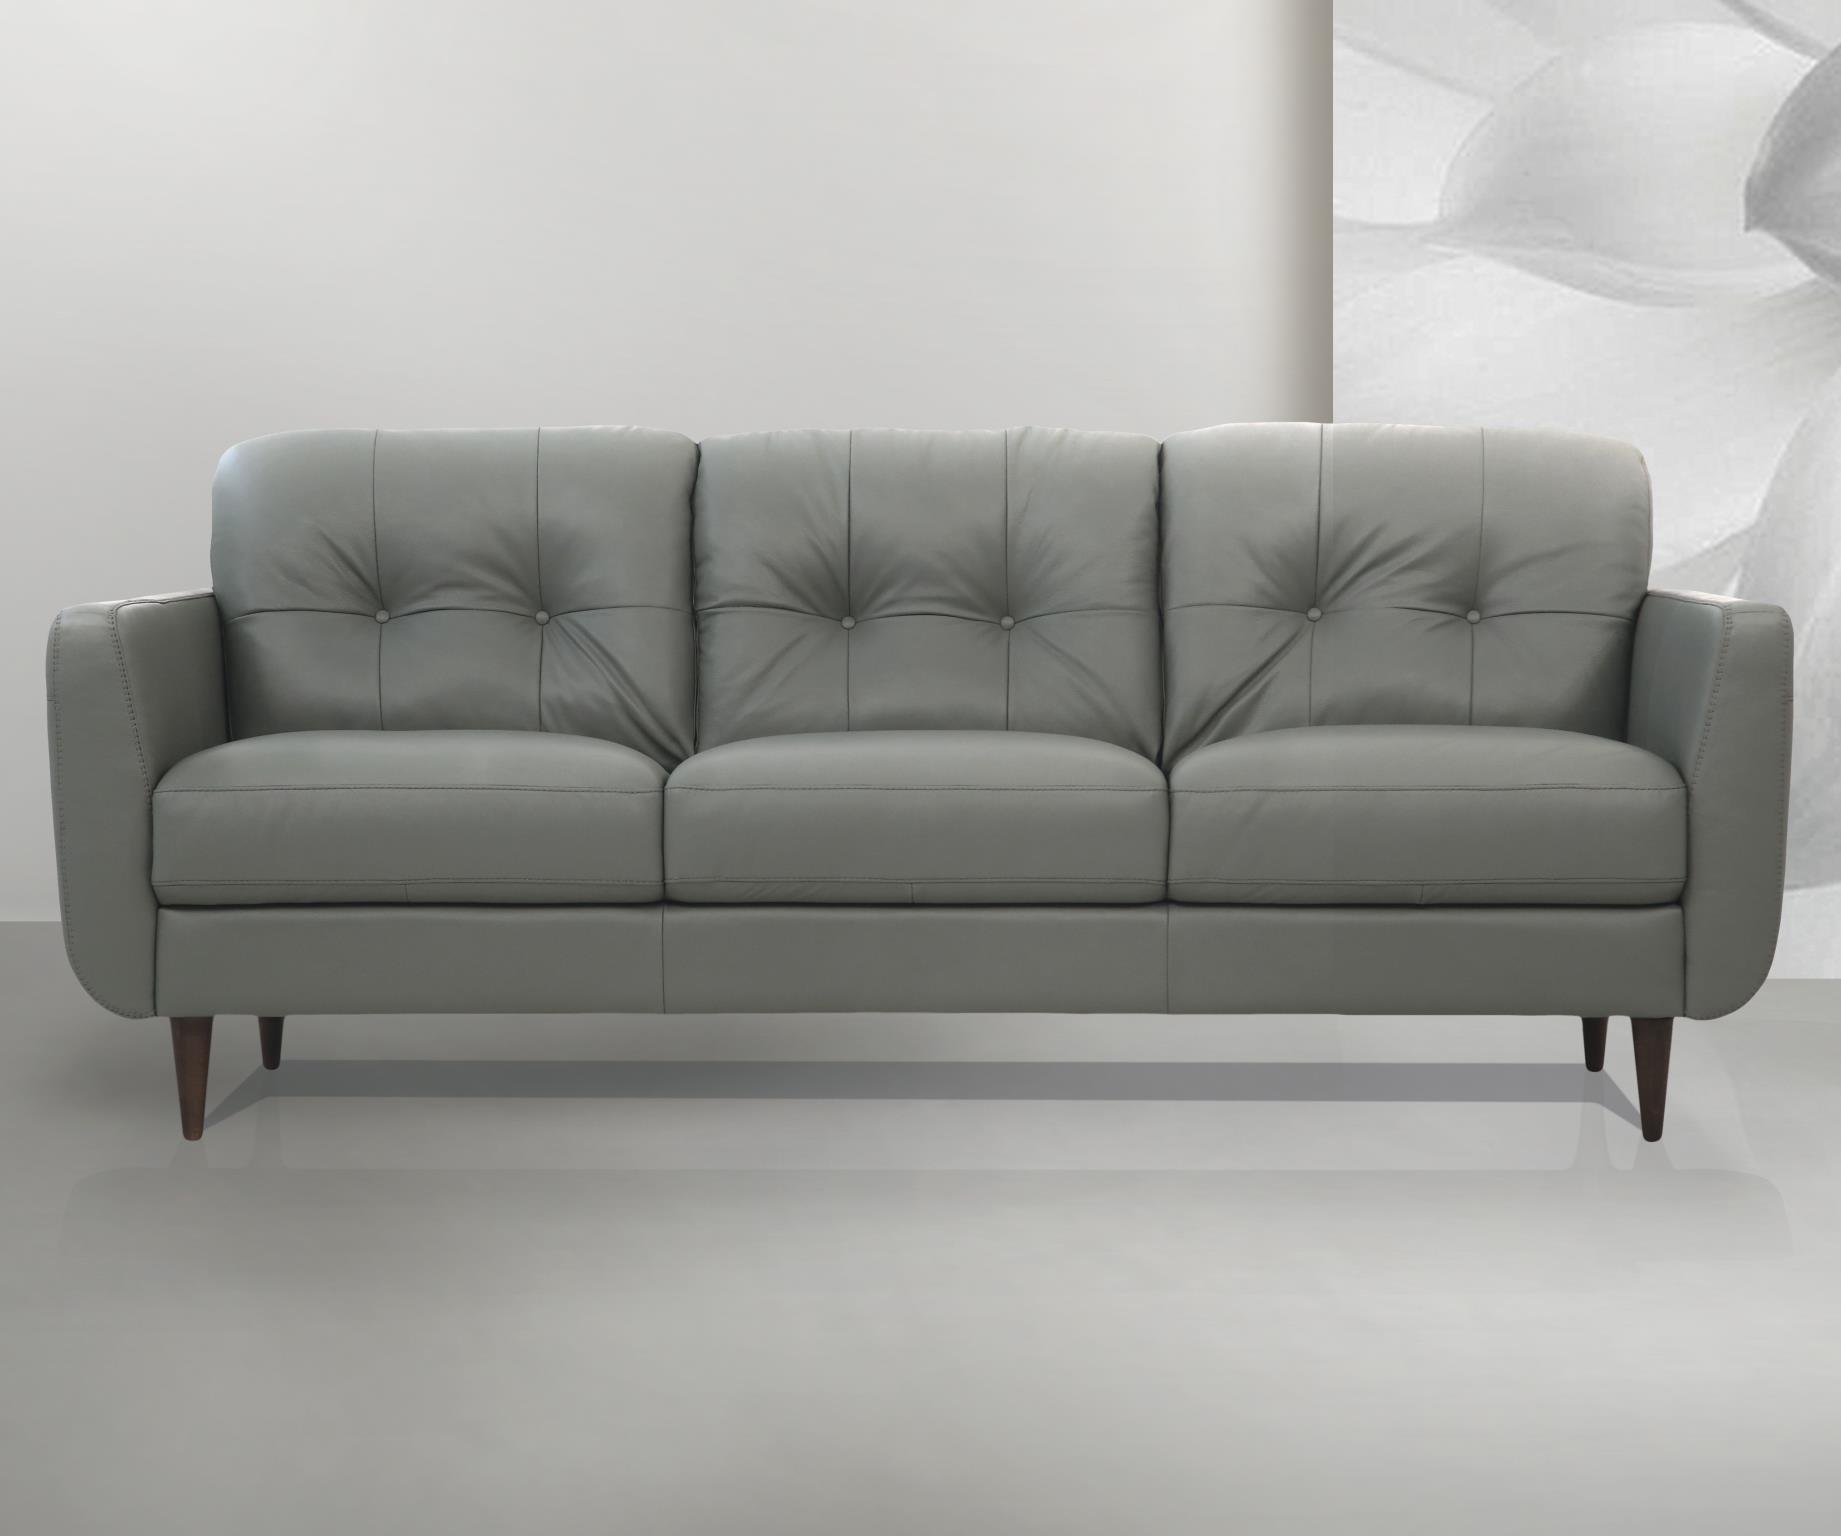 Pesto Green Complete Sofa Set